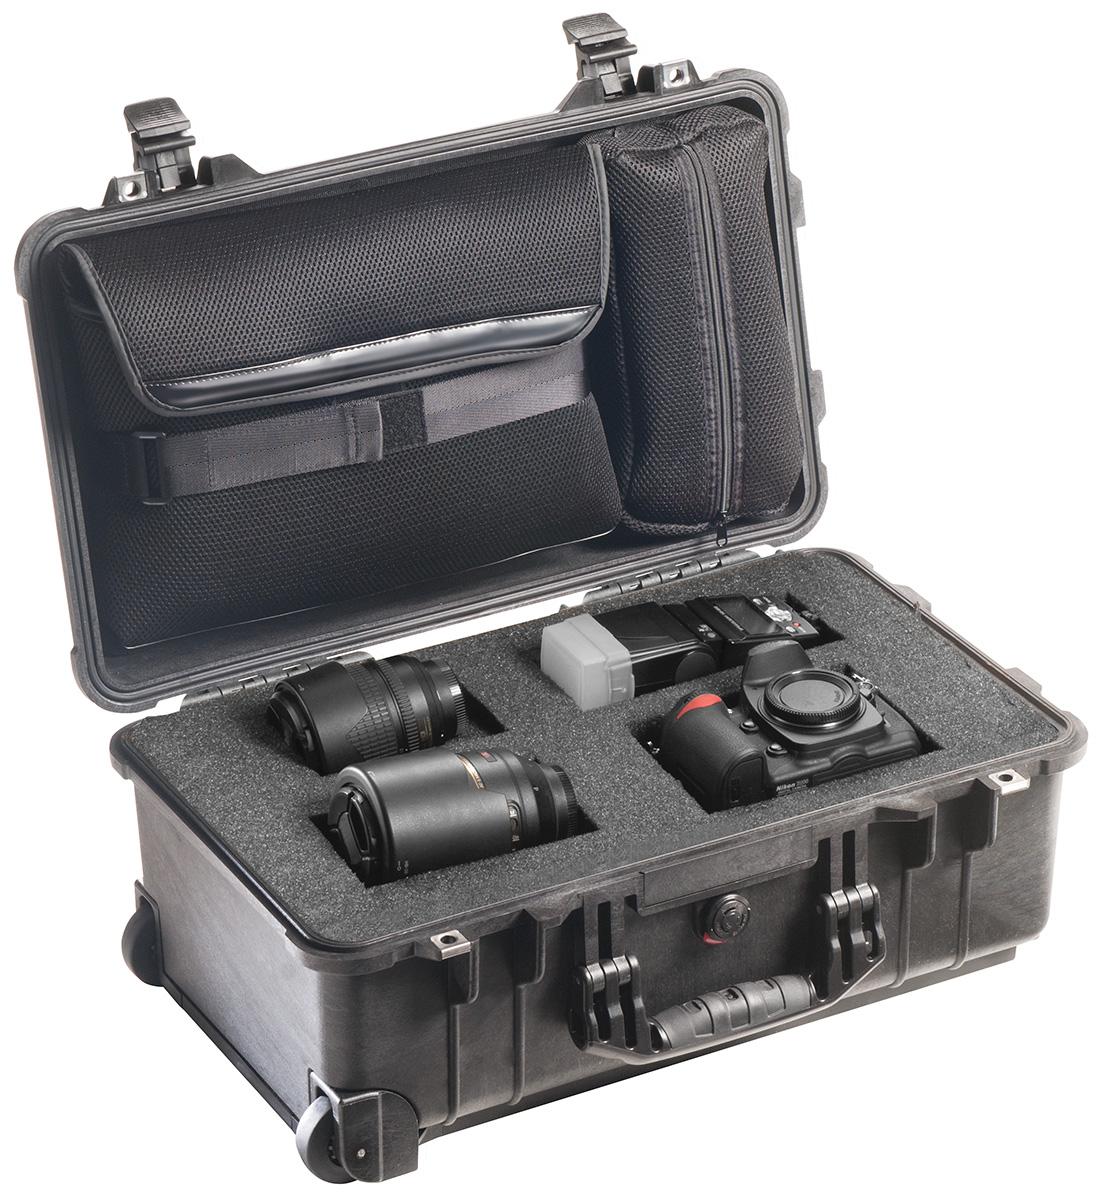 pelican professional rolling travel camera case